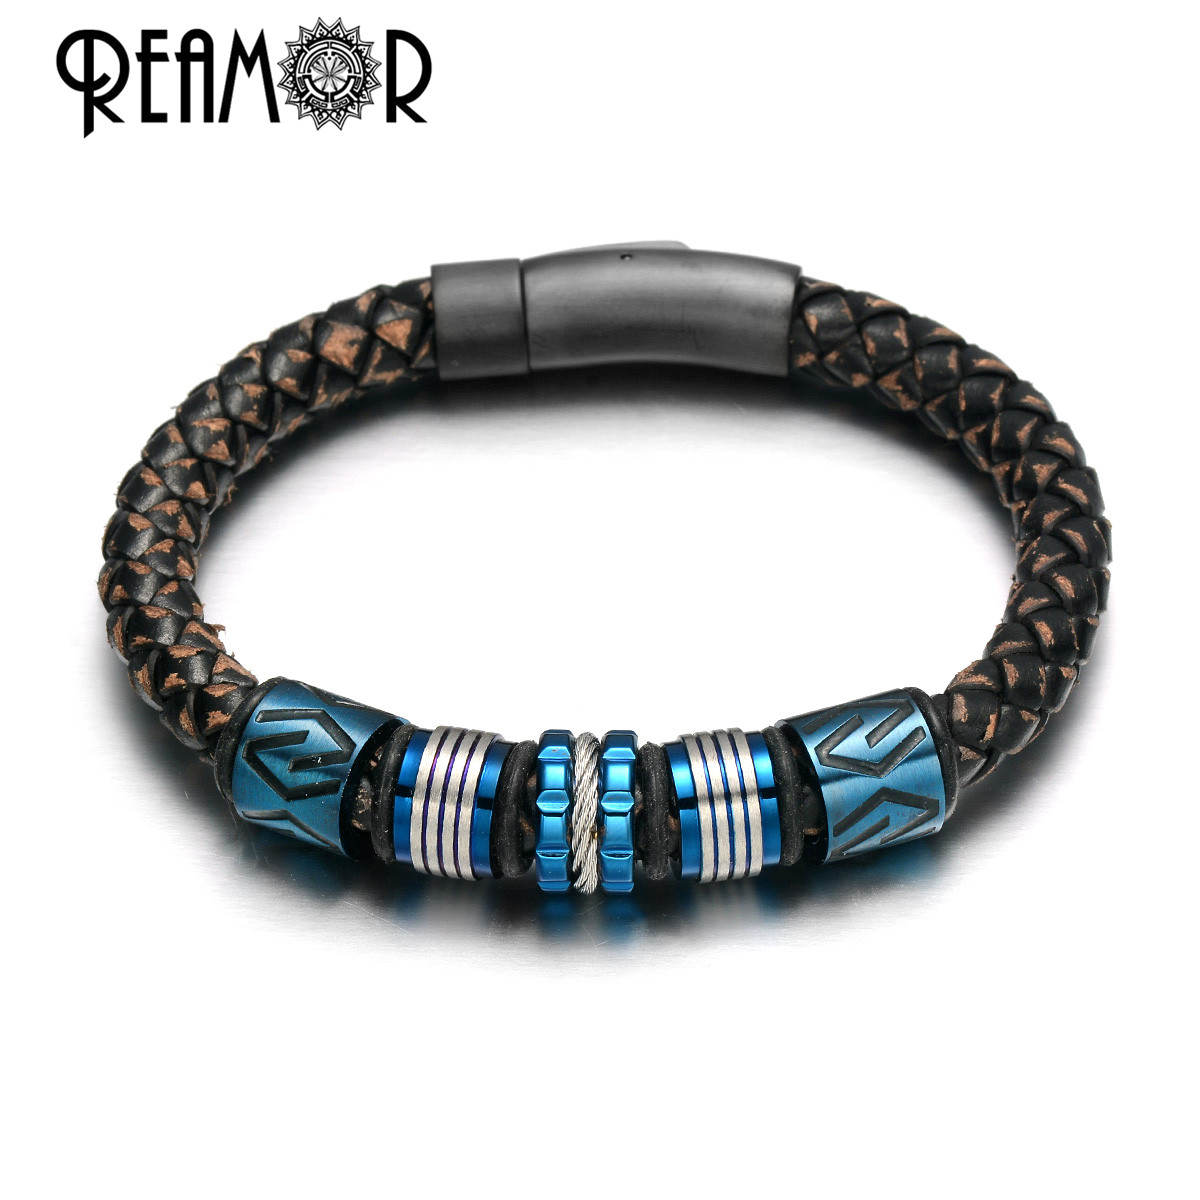 REAMOR Retro Textured Cowhide Genuine Leather Bracelet Men 316l Stainless steel Blue CNC Beads Handmade Bracelets Woven Bangle